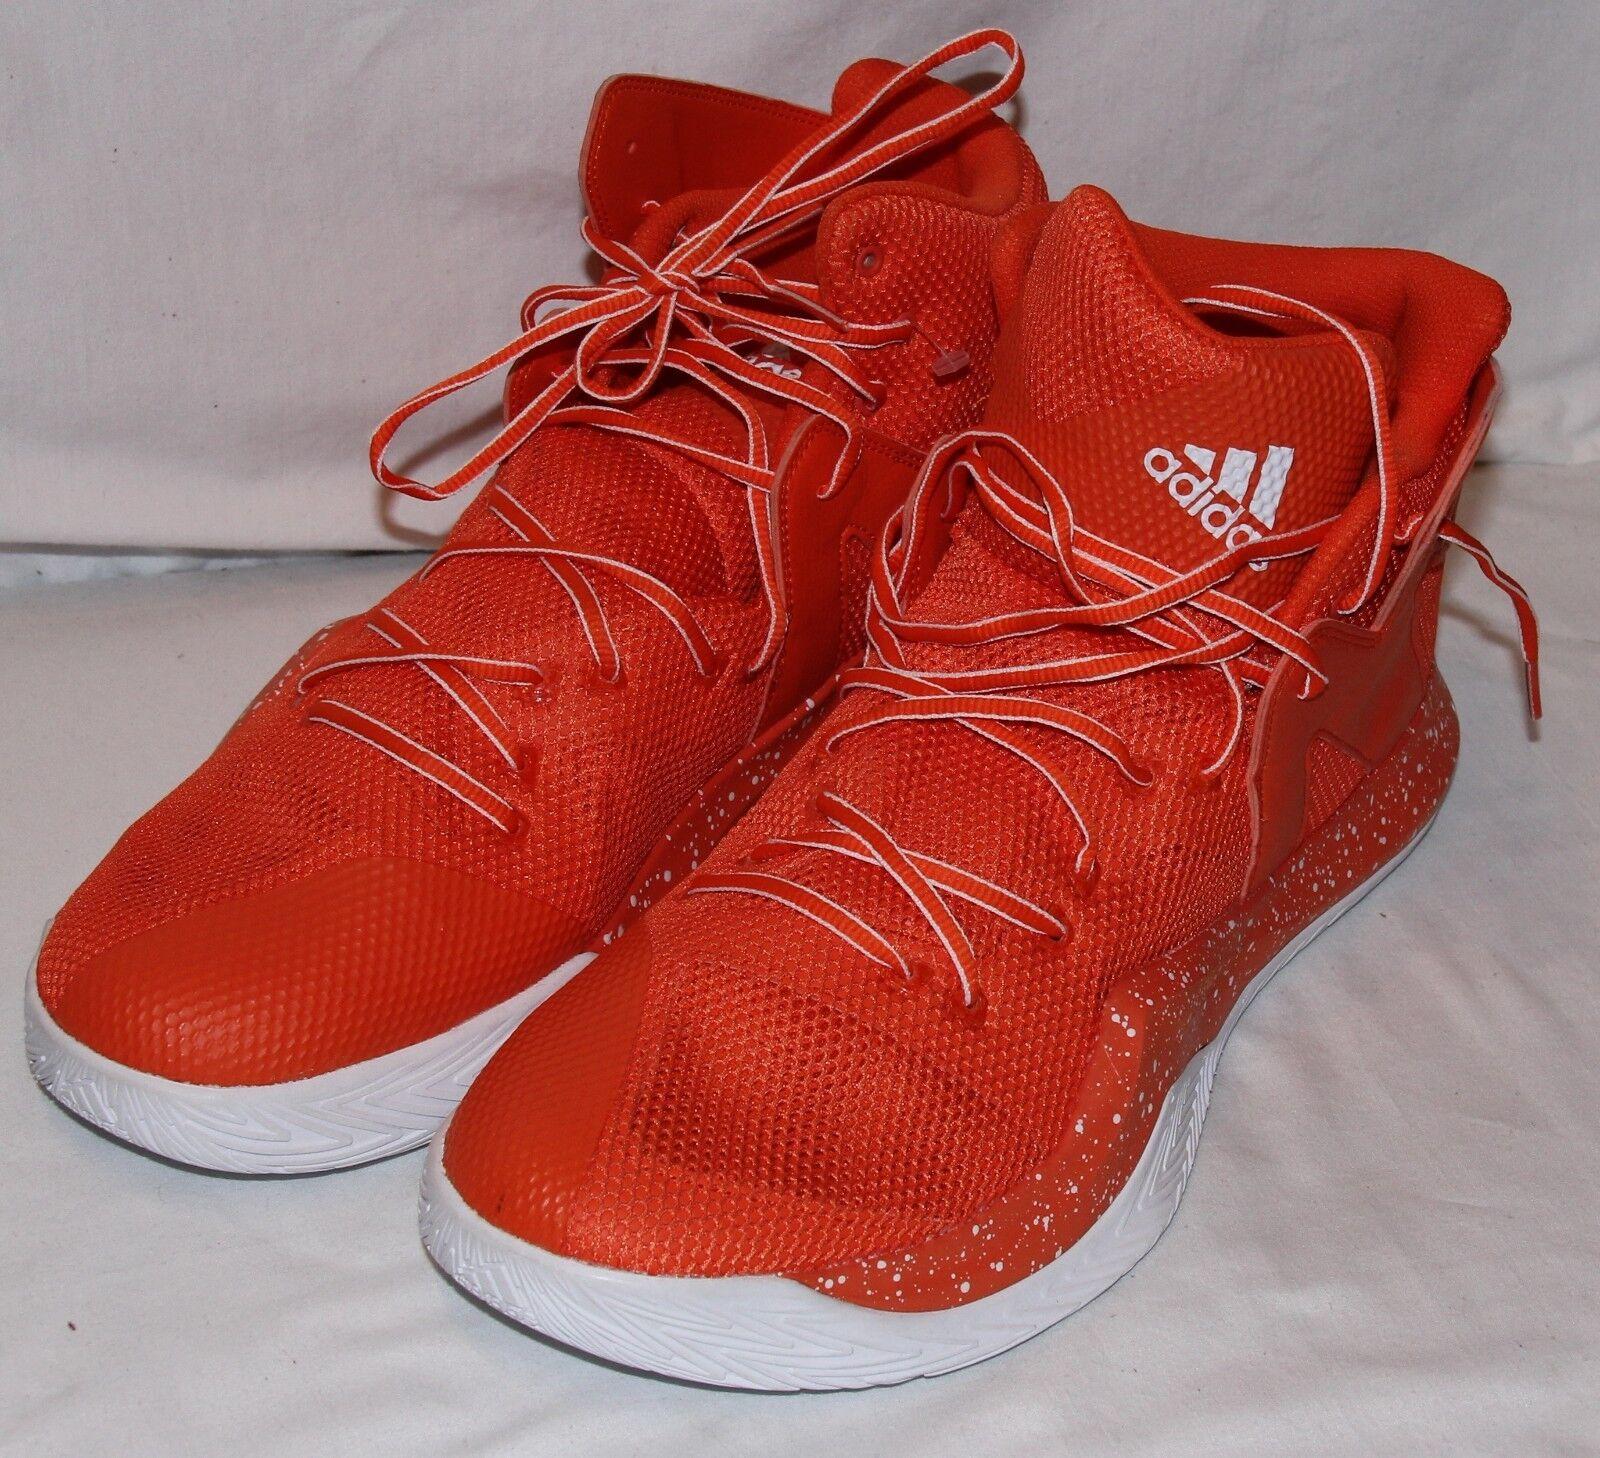 Adidas New New Adidas Uomo Uomo Uomo arancia bianca Basketball Scarpe Scarpe da   38a9cc